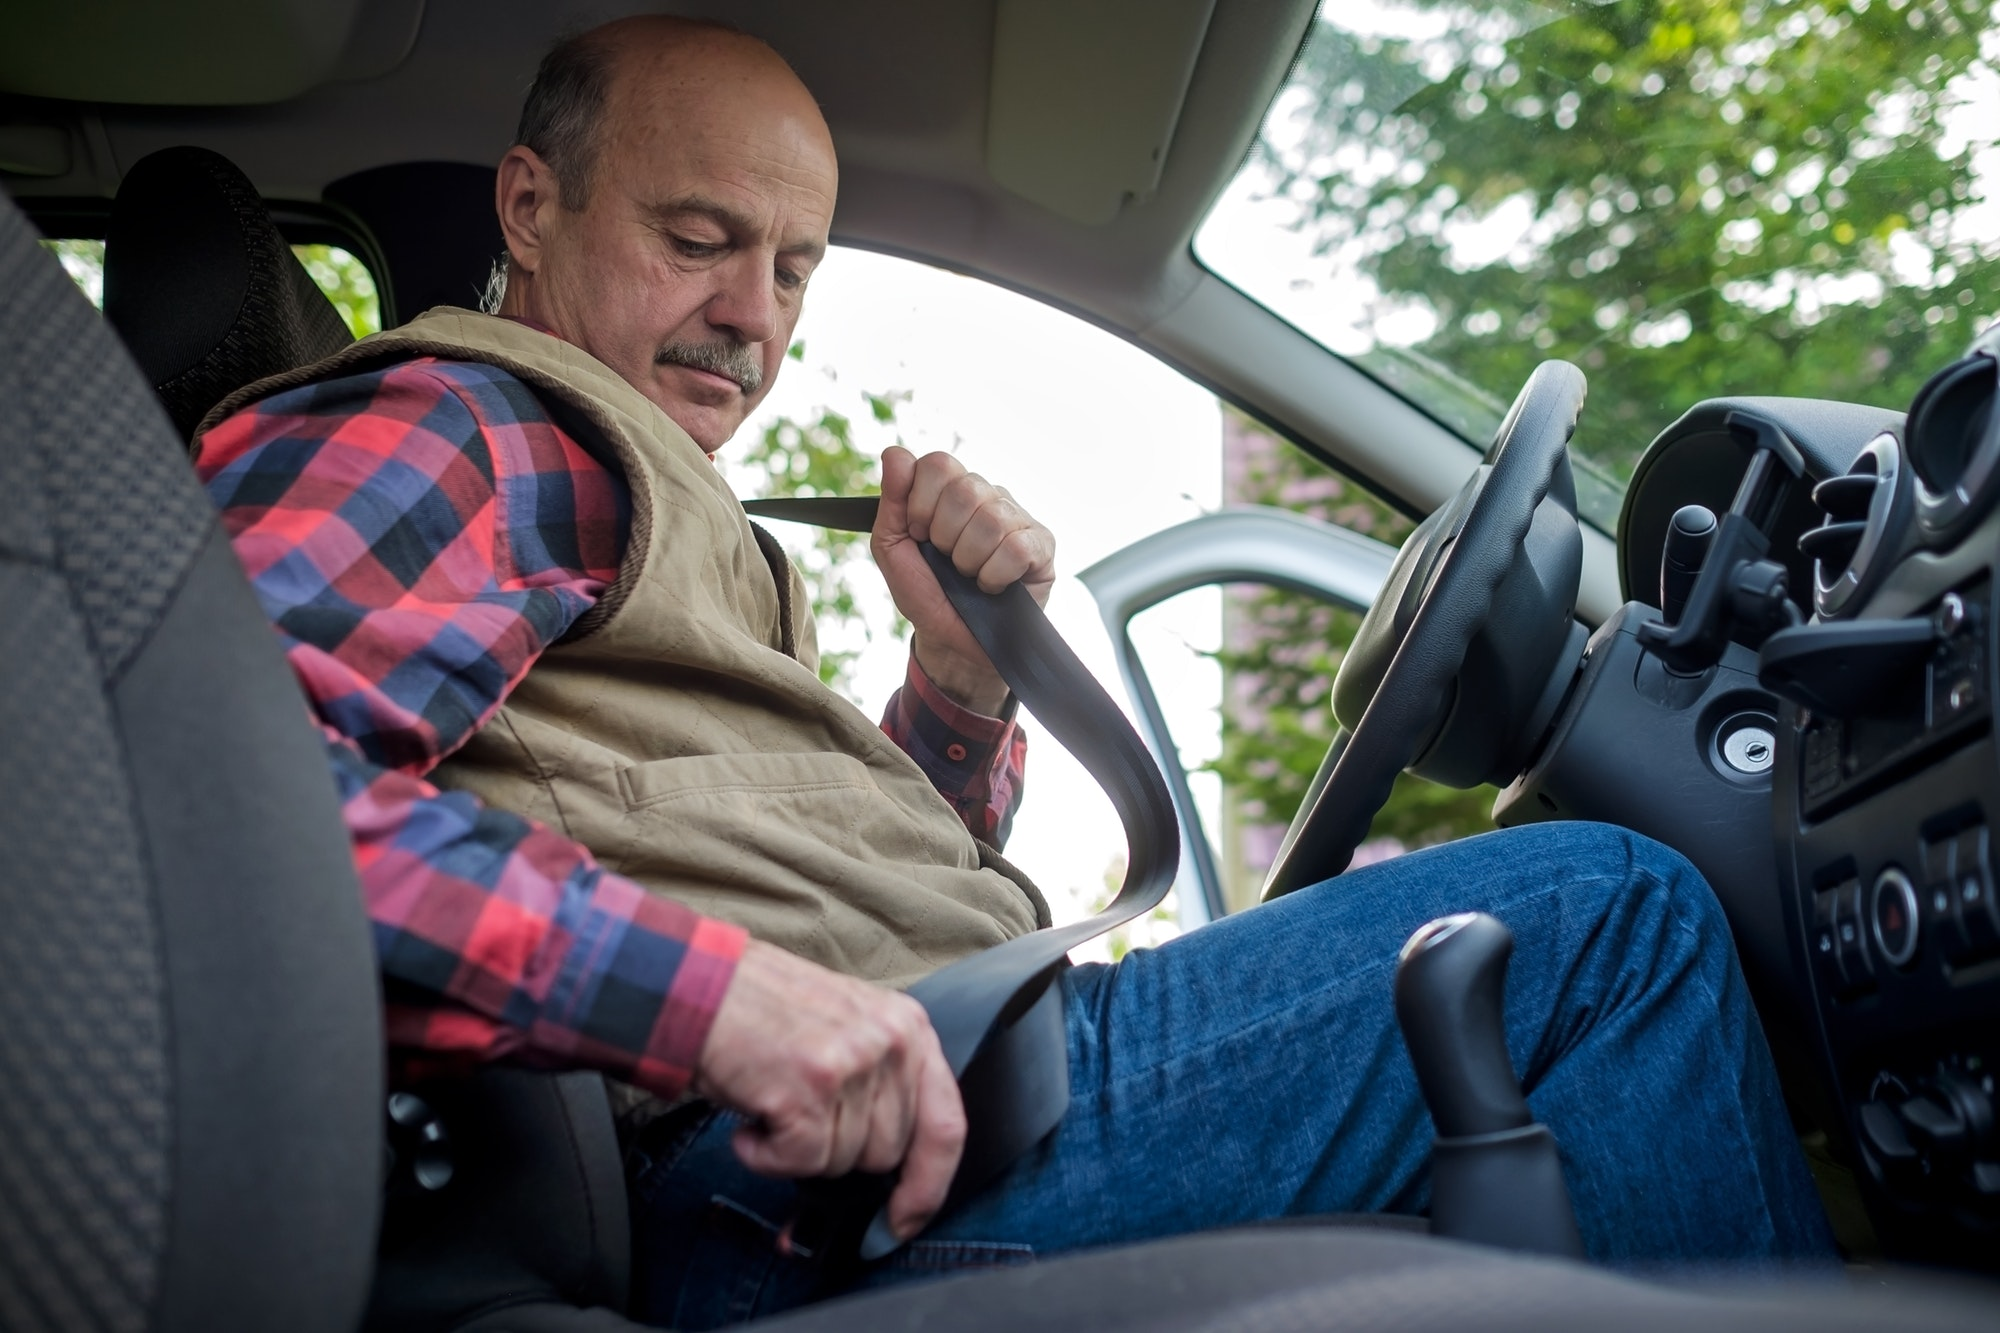 Mature man fastening seat belt in car